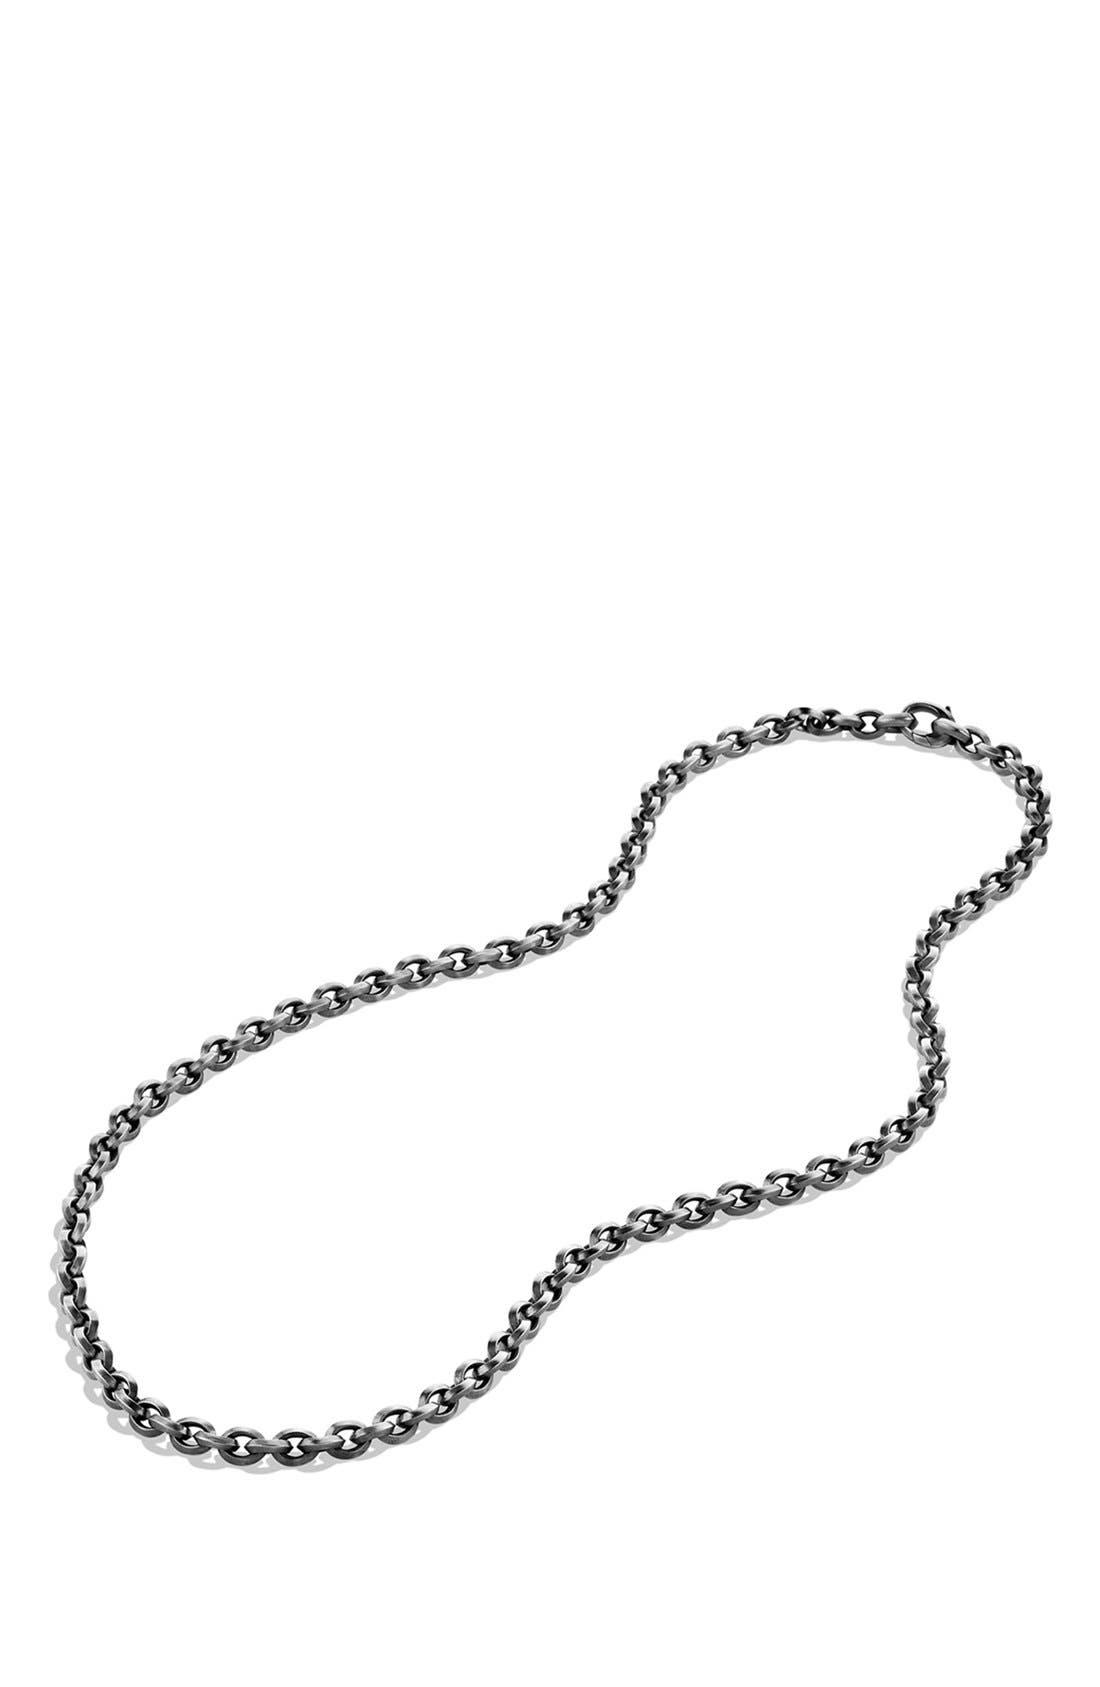 Alternate Image 2  - David Yurman 'Knife Edge' Chain Necklace